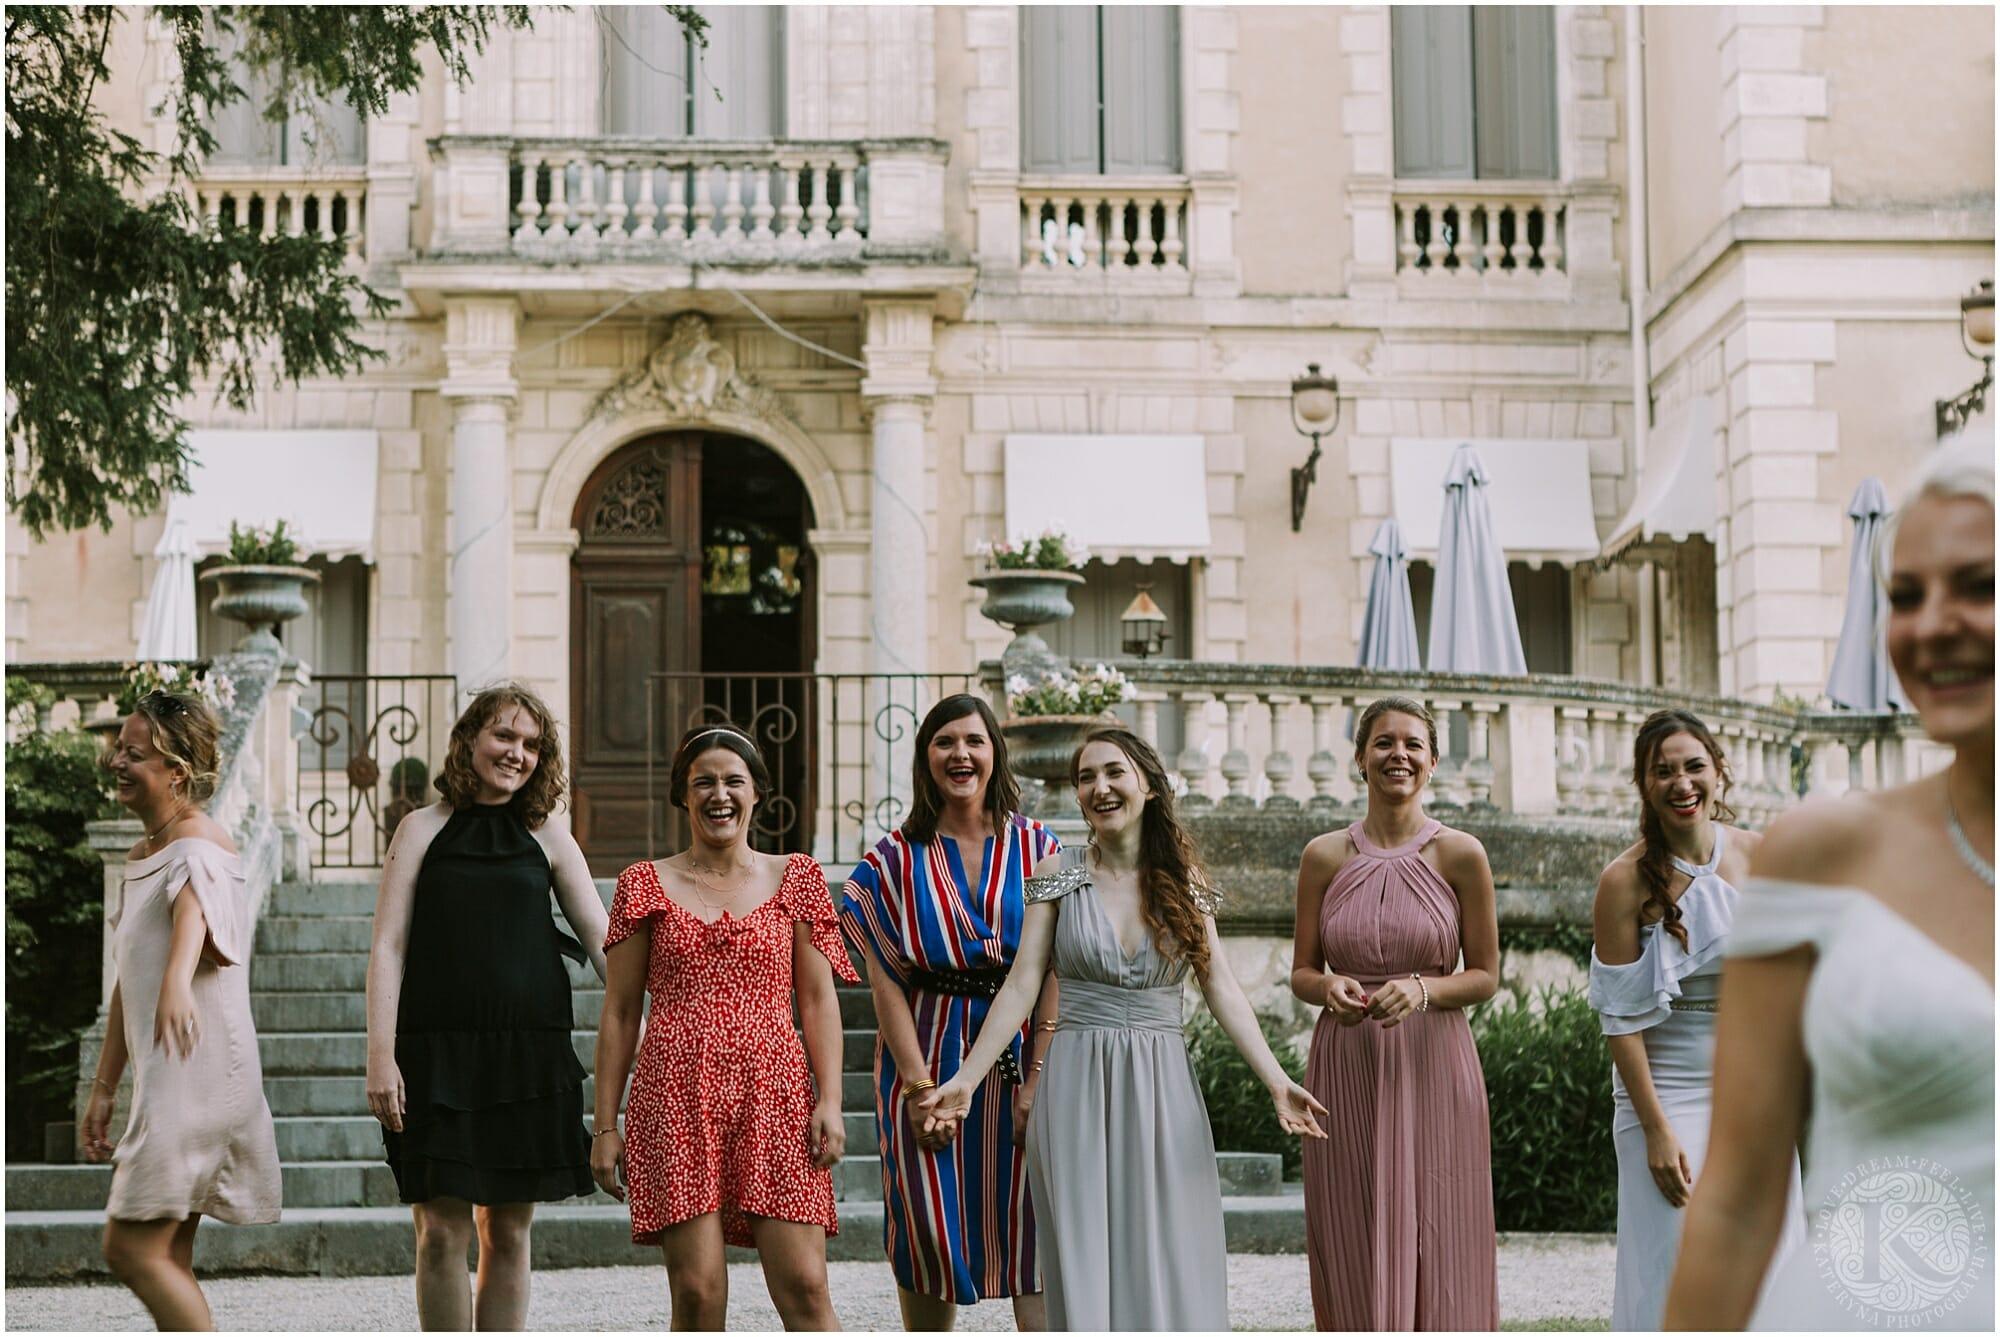 Kateryna-photos-photographe-mariage-chateau-des-3-fontaines-provence-avignon-vaucluse-sud_0078.jpg